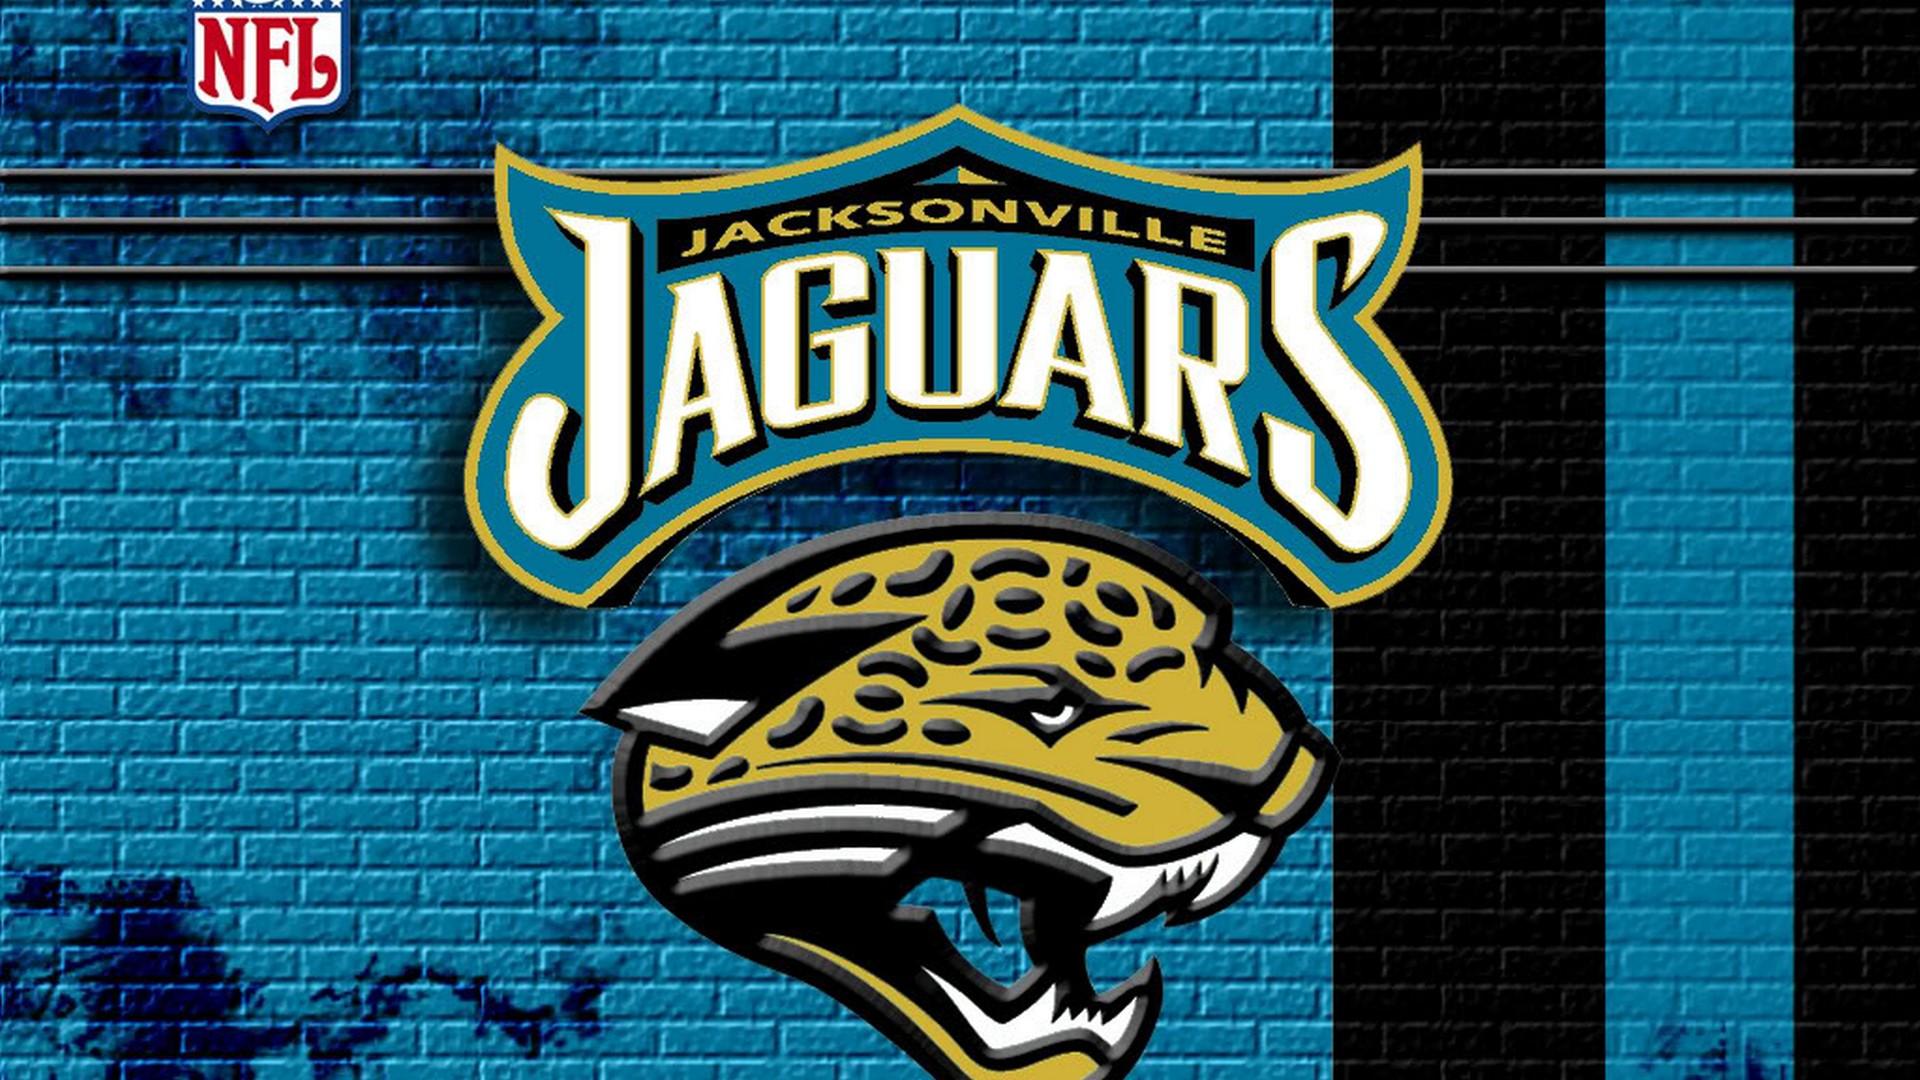 Jacksonville Jaguars Desktop Wallpapers 2019 NFL Football Wallpapers 1920x1080